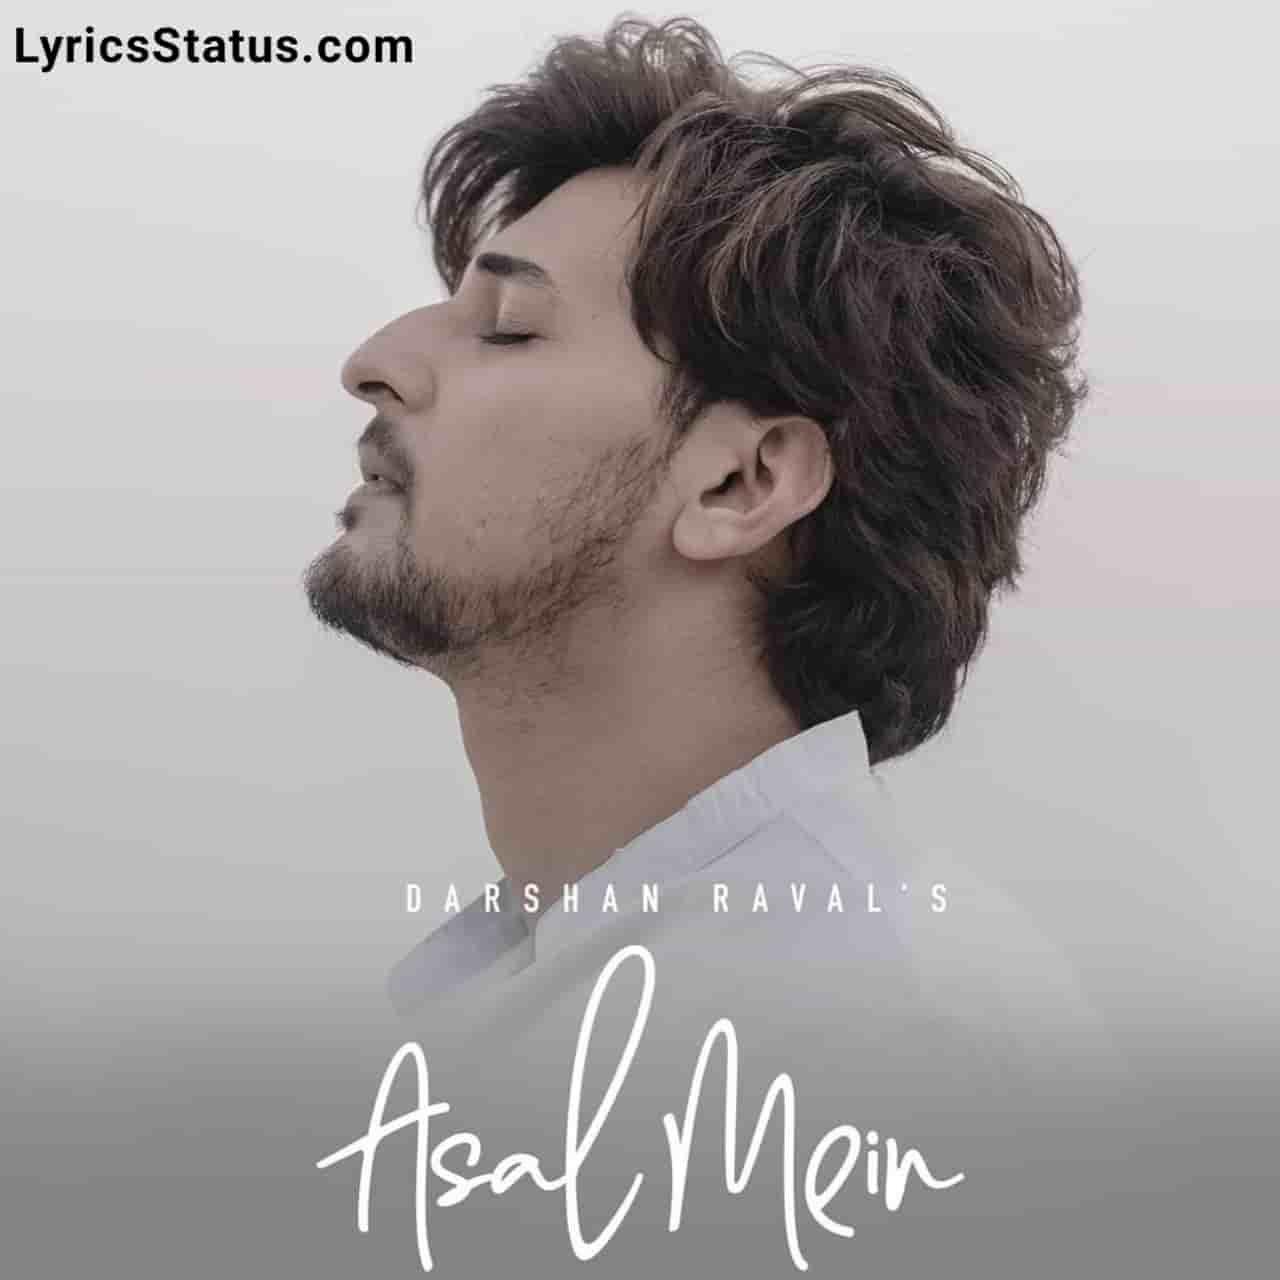 Darshan Raval New Song Asal Mein Lyrics Status Download Video Latest hindi song Asal mein, tum nahi ho mere hindi song Asal Mein Darshan Raval